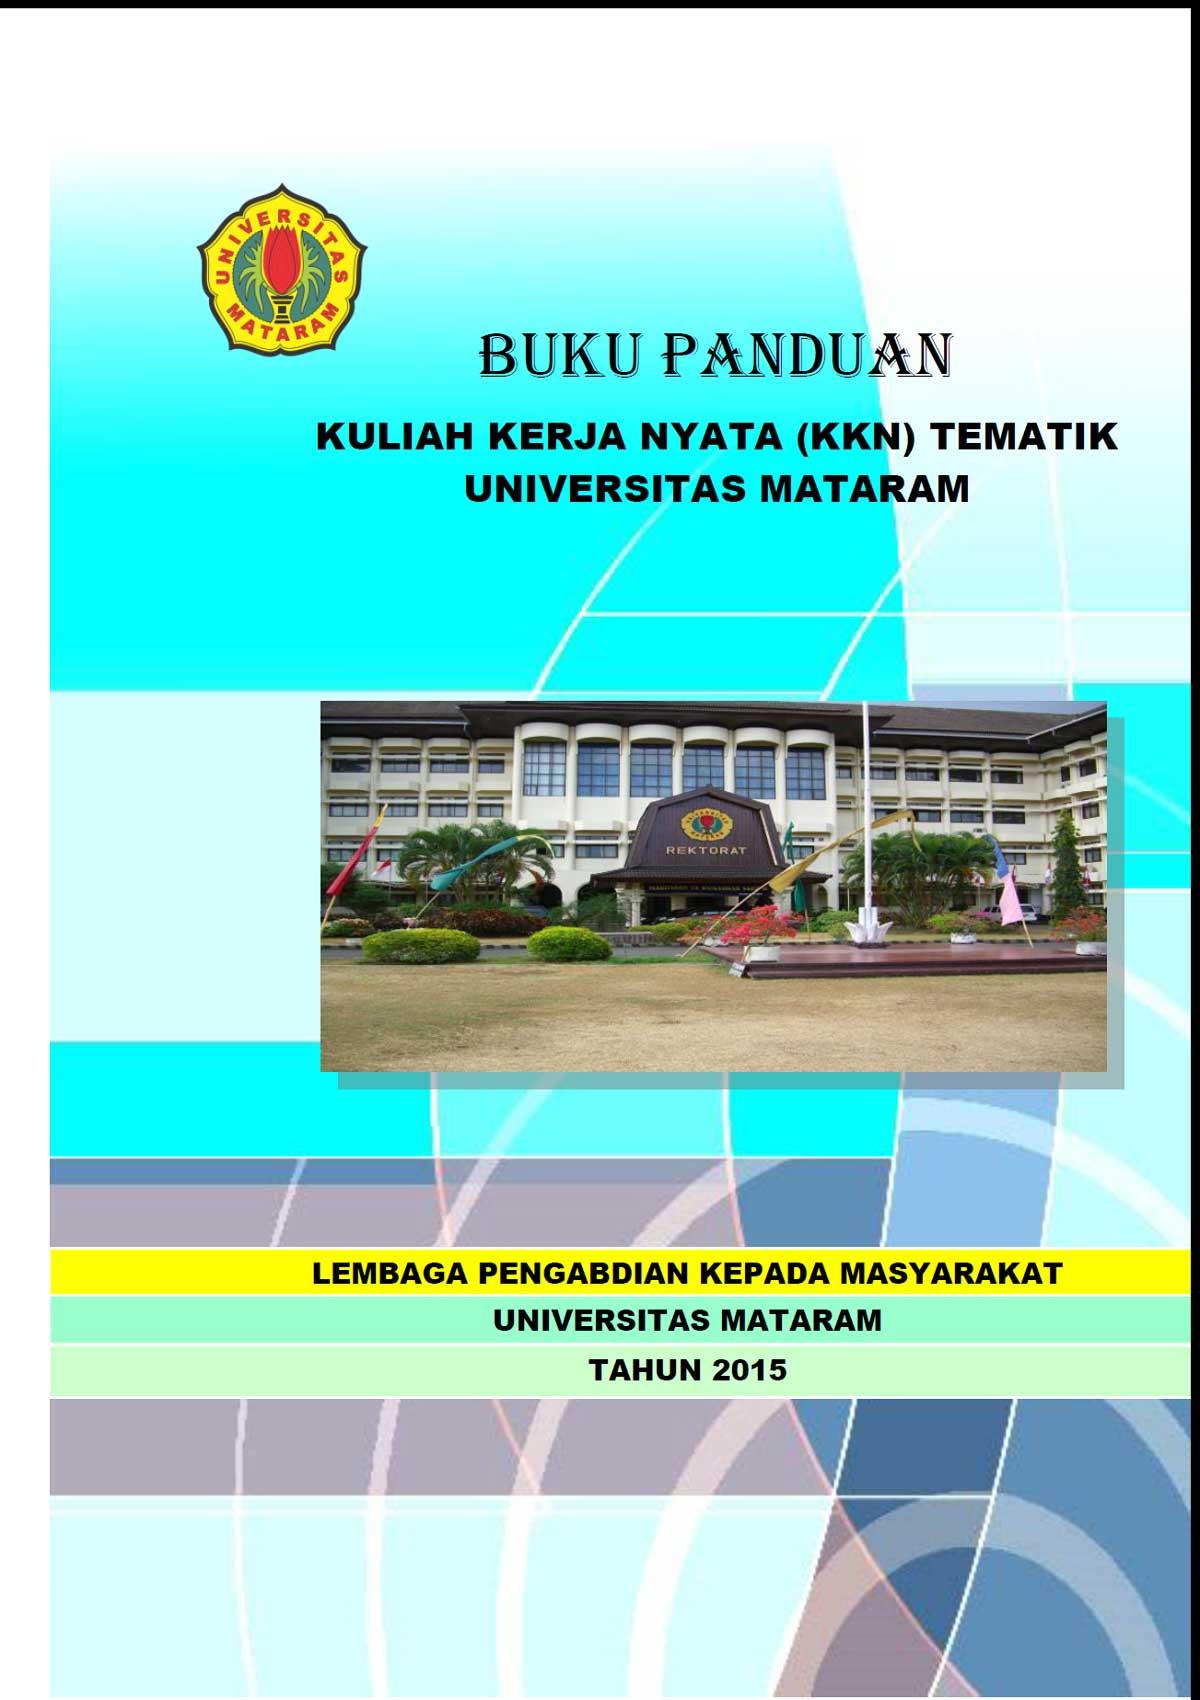 Buku Panduan Kuliah Kerja Nyata Kkn Tematik Universitas Mataram 2015 Lppm Unram